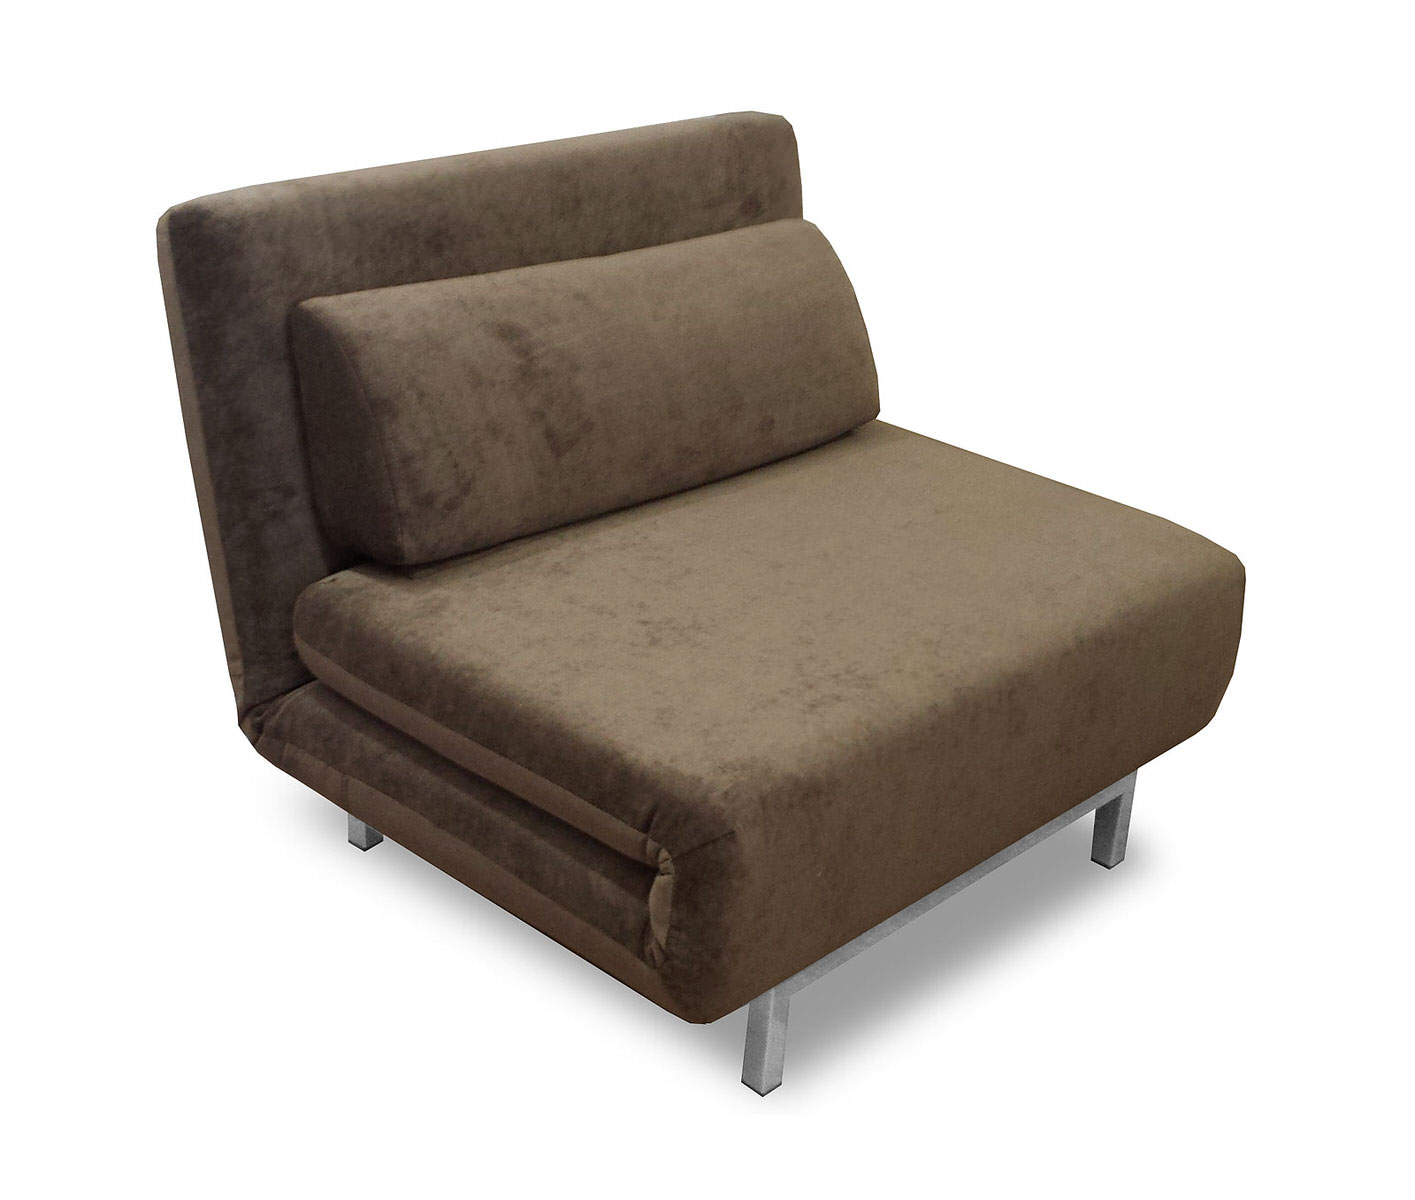 convertible sofa beds new york jacksonville futon sleeper bed floor sample chair lk06 dark brown